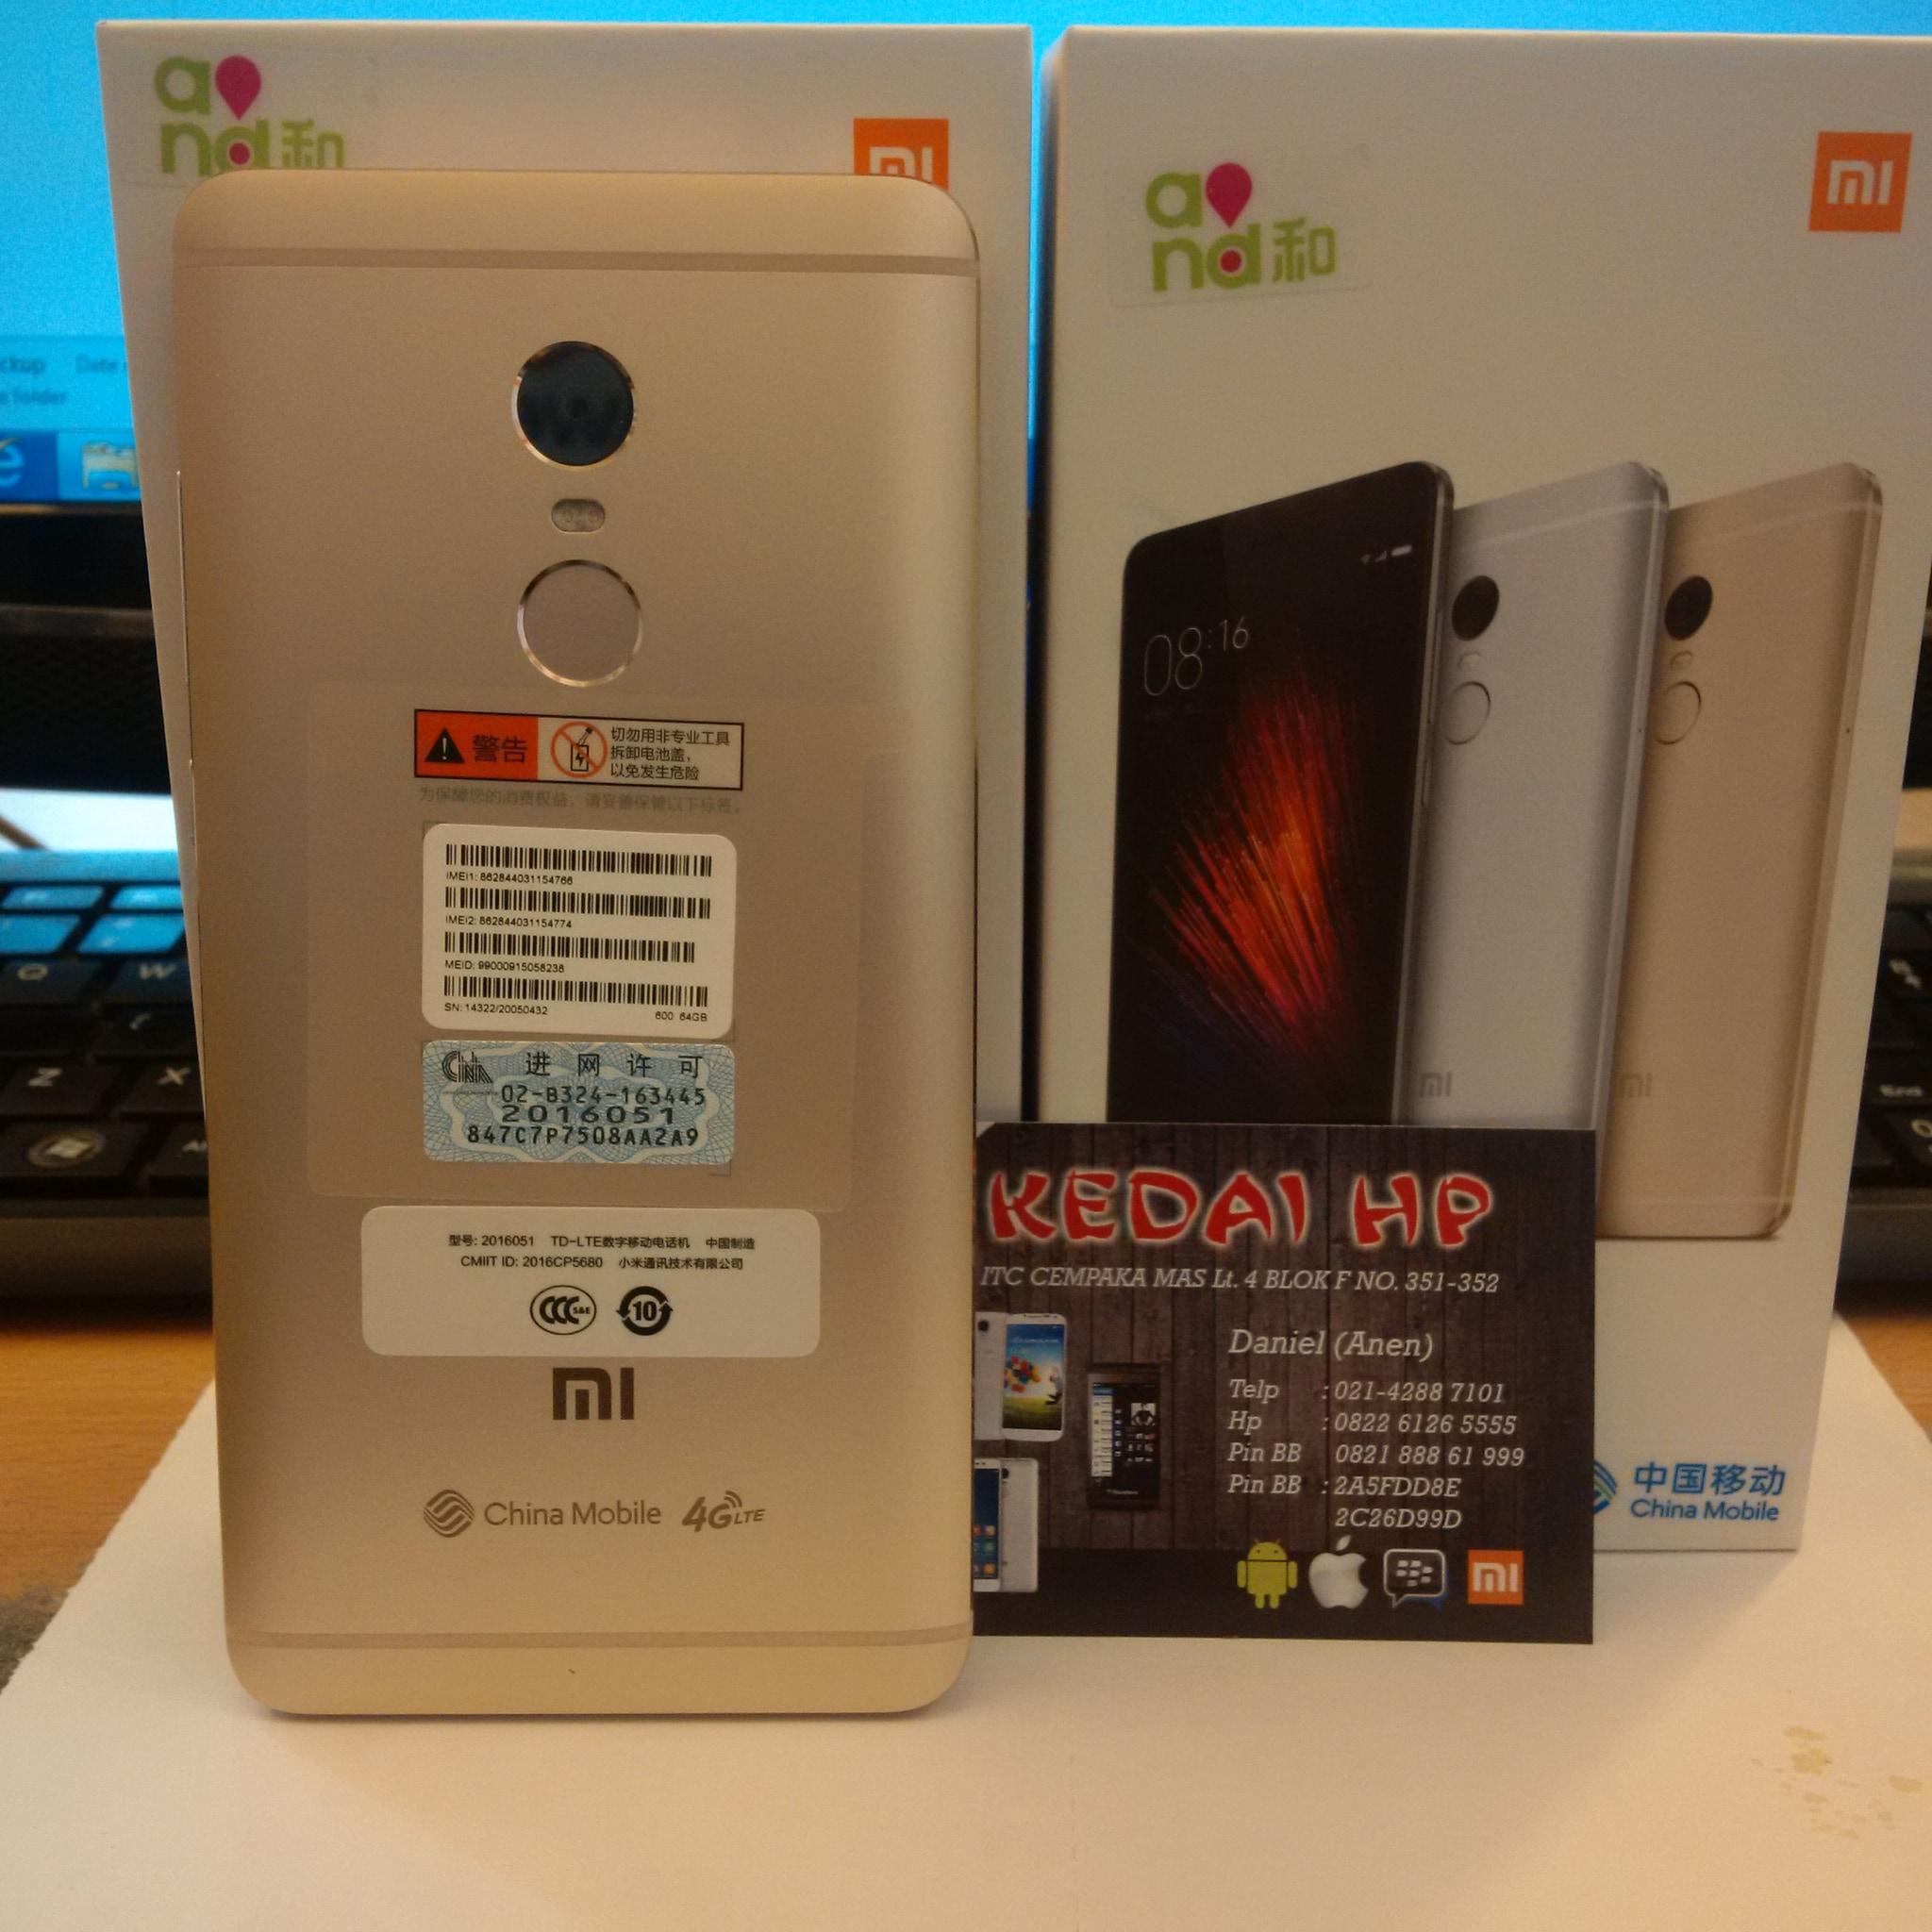 Jual Xiaomi Redmi Note 4 364 Garansi Distributor 1 Tahun 2 16gb 4g Lte